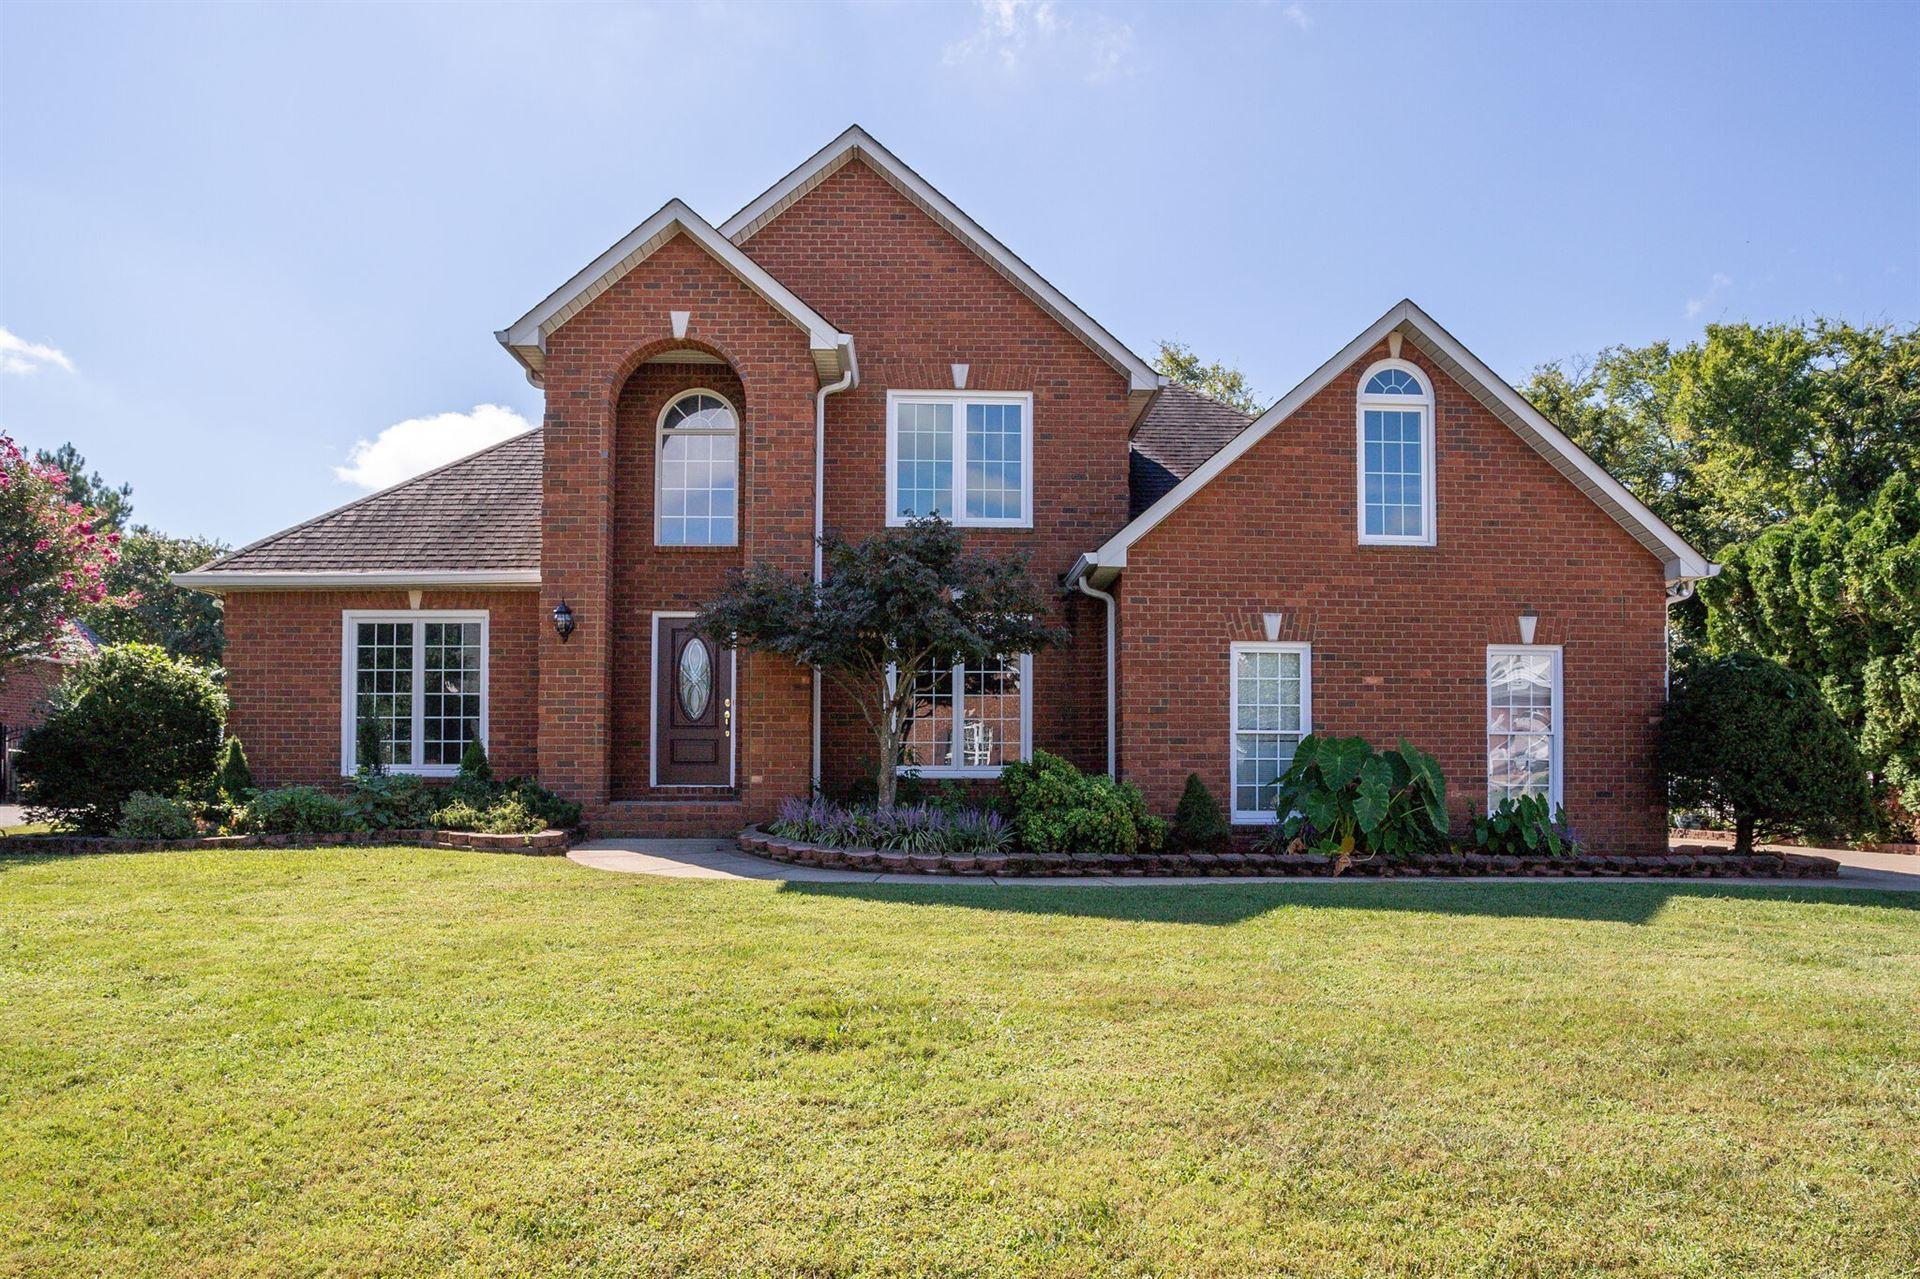 2310 Calderwood Ct, Murfreesboro, TN 37130 - MLS#: 2293722